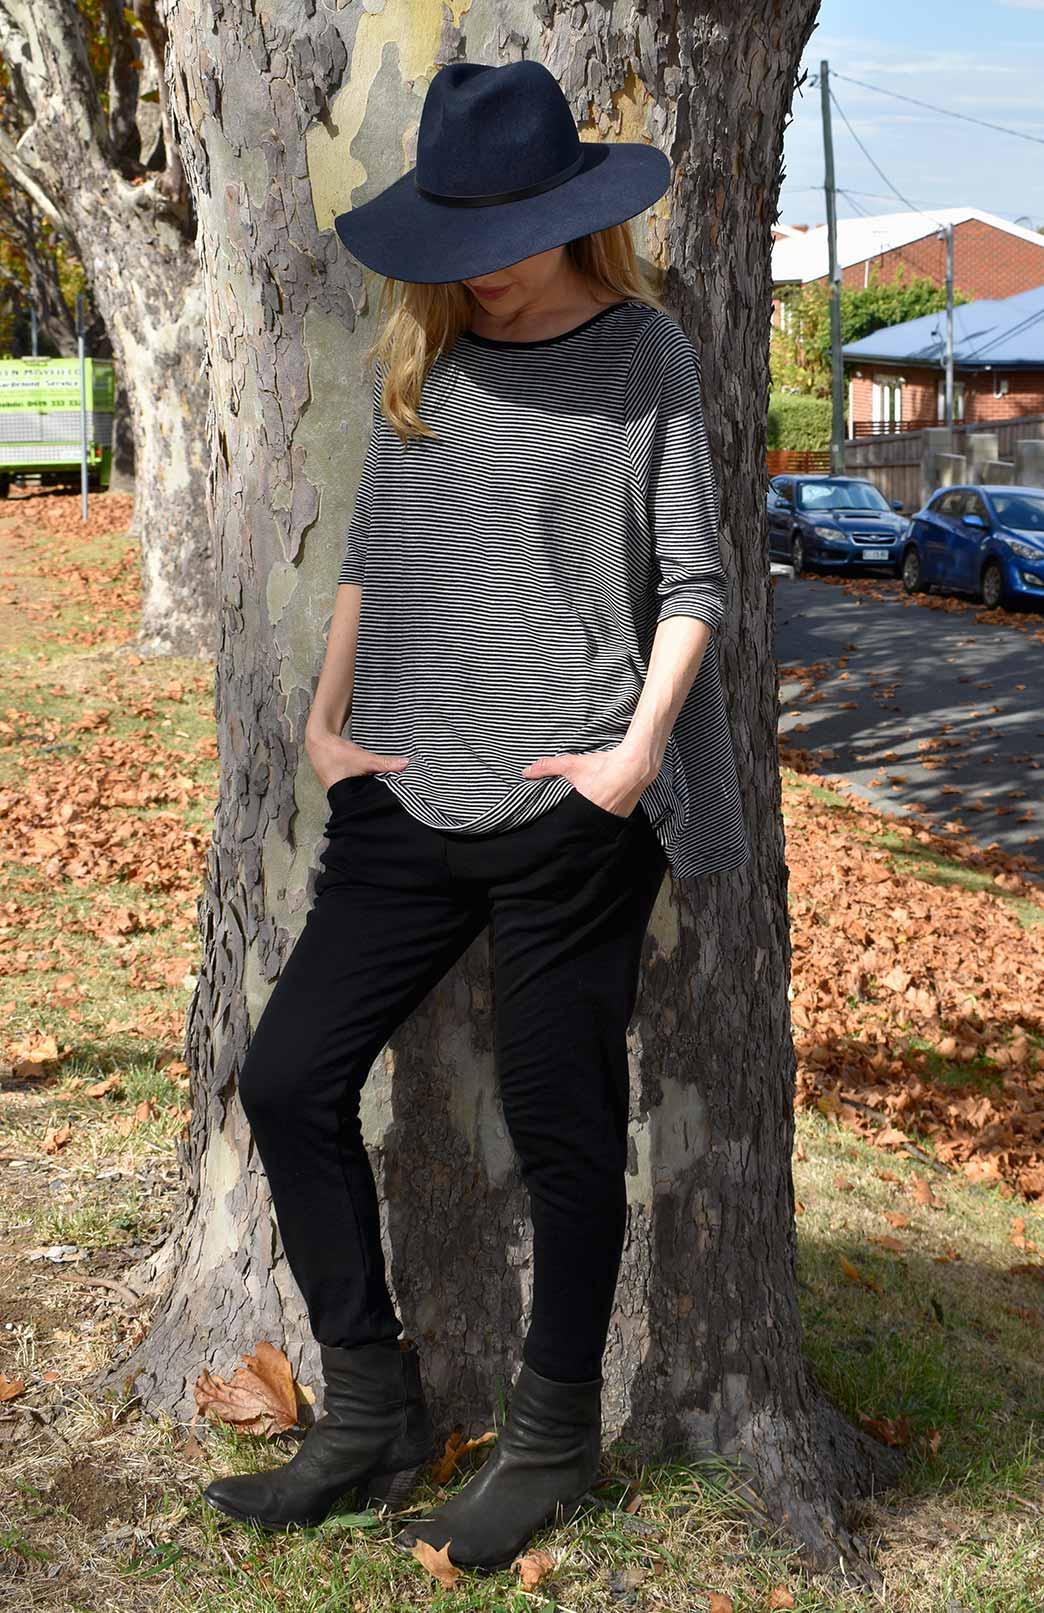 3/4 Flutter Top - Women's Striped Merino Wool 3/4 Sleeve Spring Top - Smitten Merino Tasmania Australia